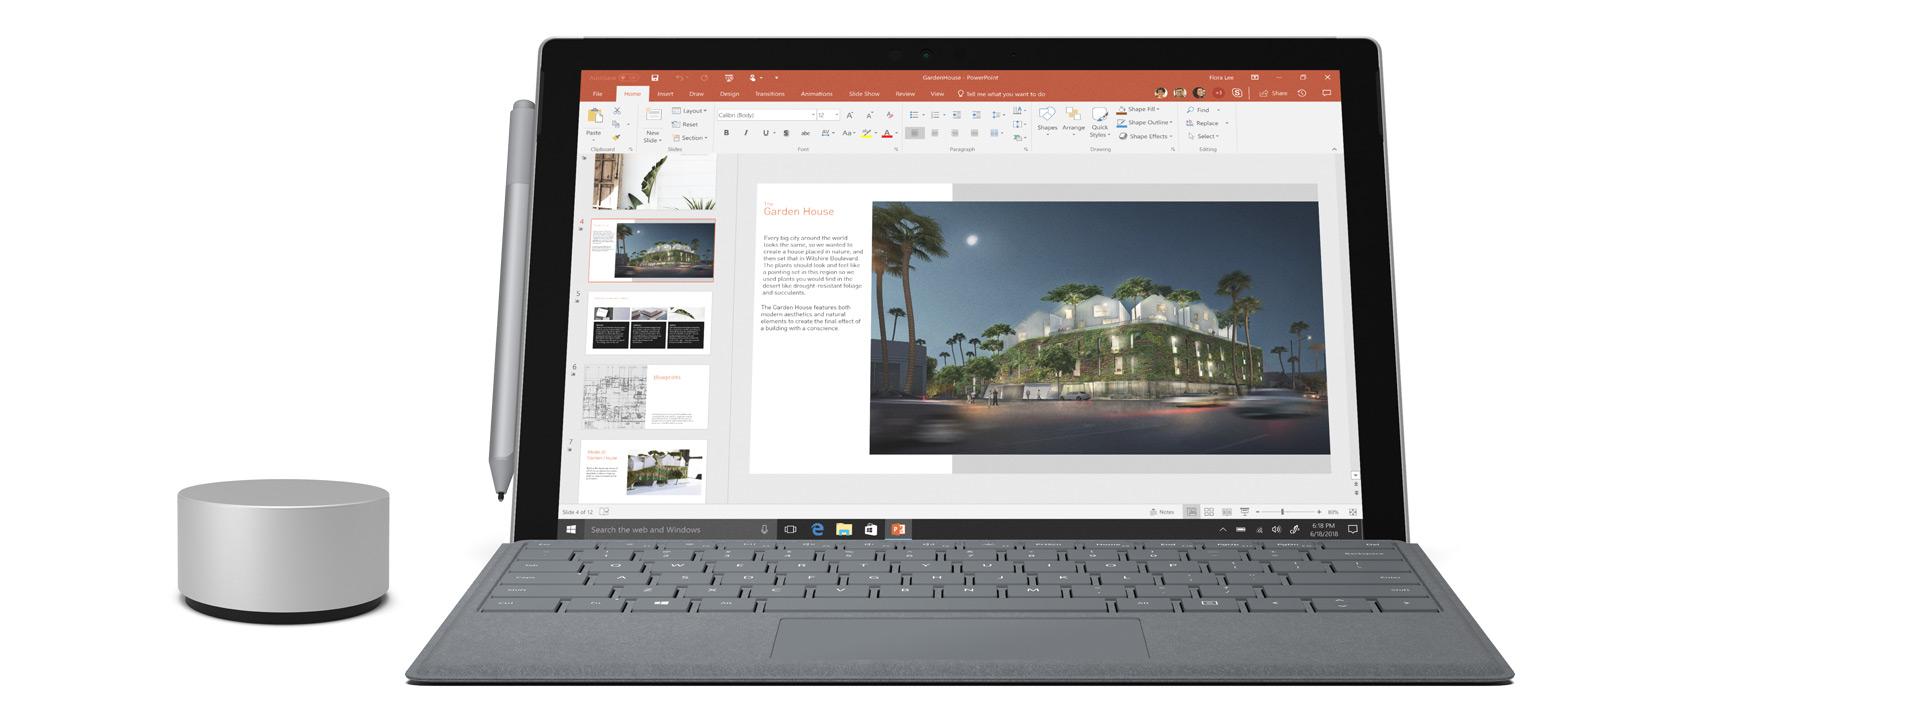 Surface Pro 與 Surface Pro 特製版實體鍵盤保護蓋、Surface 手寫筆和 Surface Dial